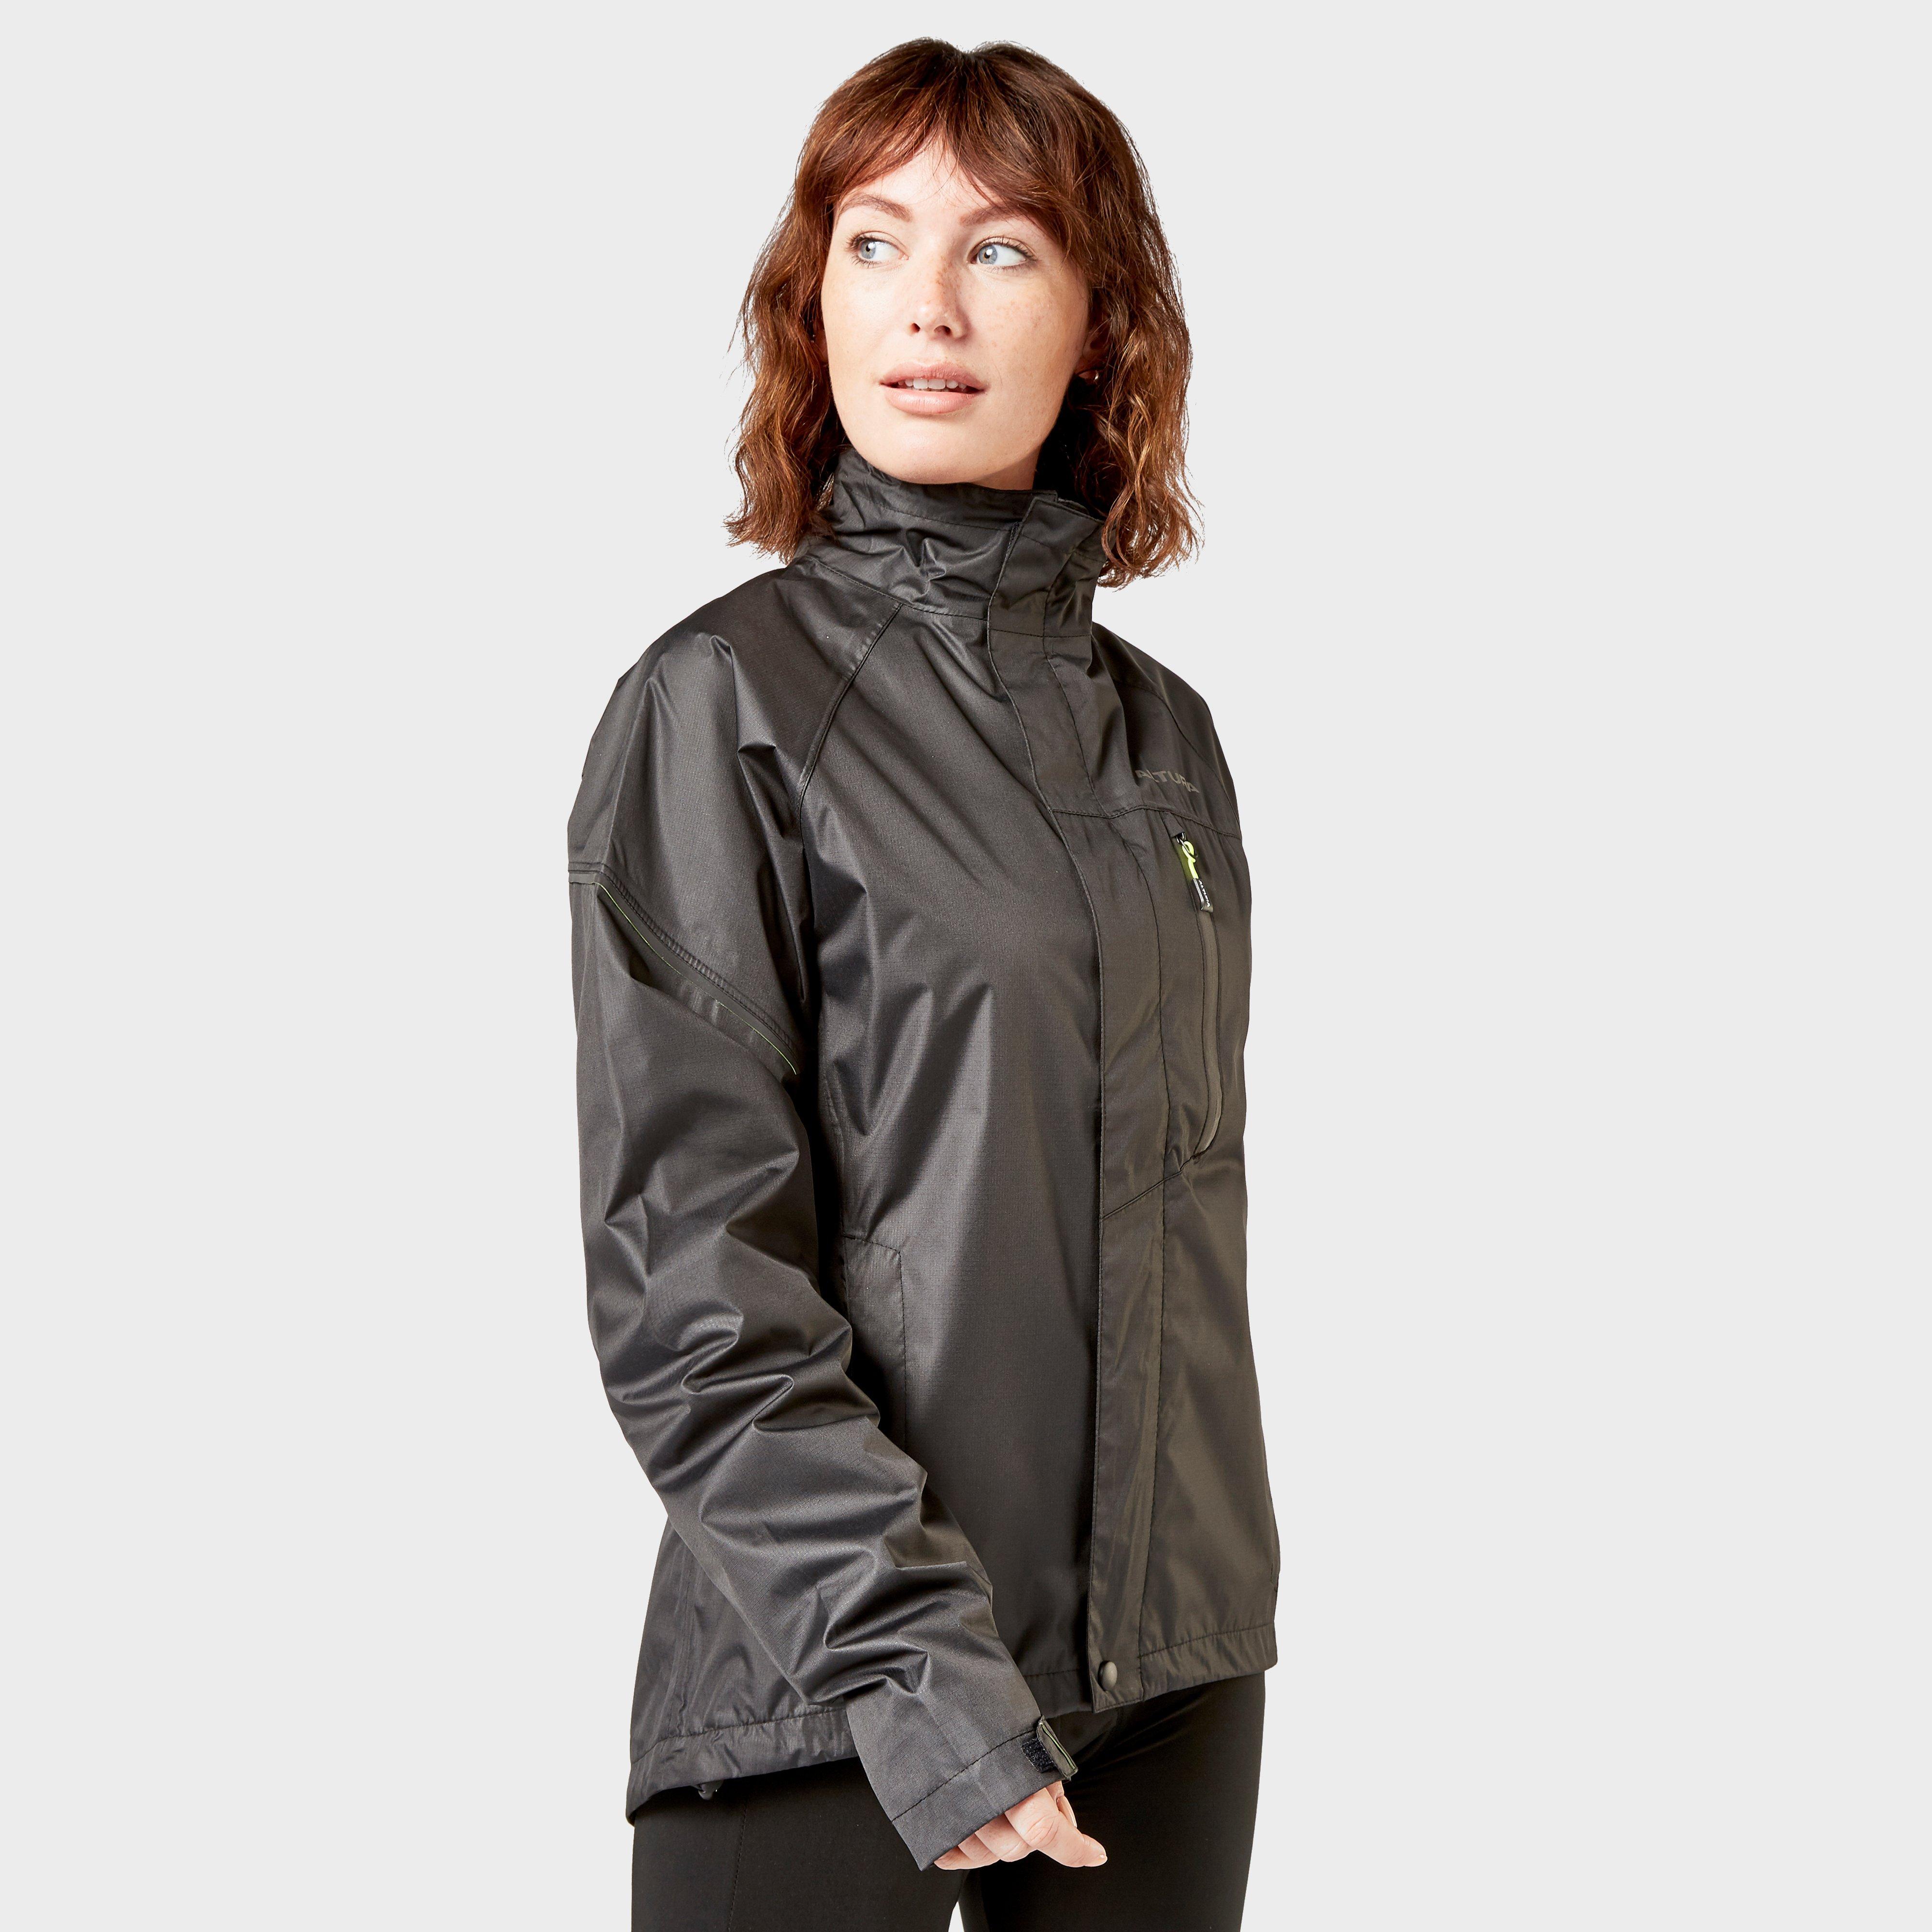 Altura Altura womens Nevis Waterproof Jacket - Black, Black